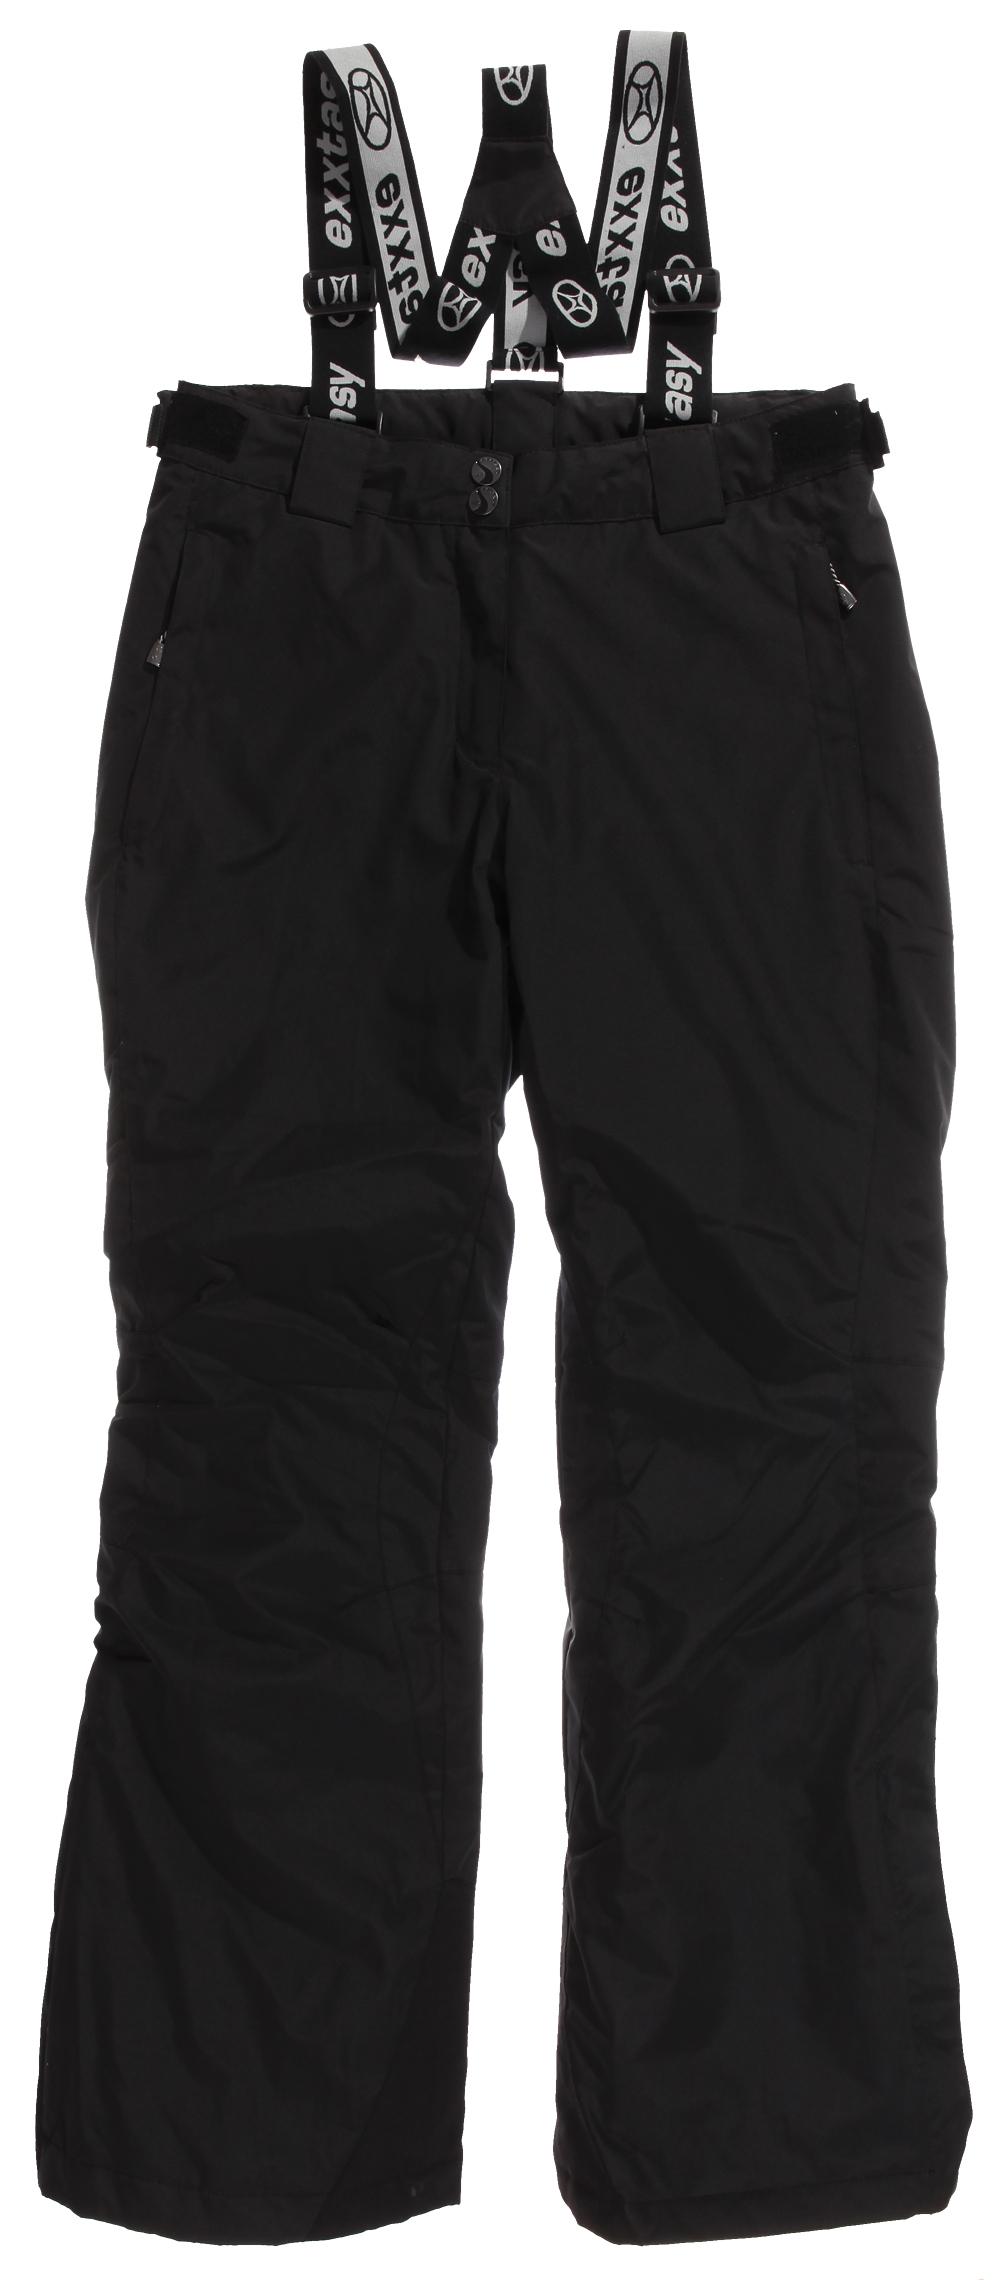 Lyžařské kalhoty pánské Exxtasy Tarare Velikost: 58